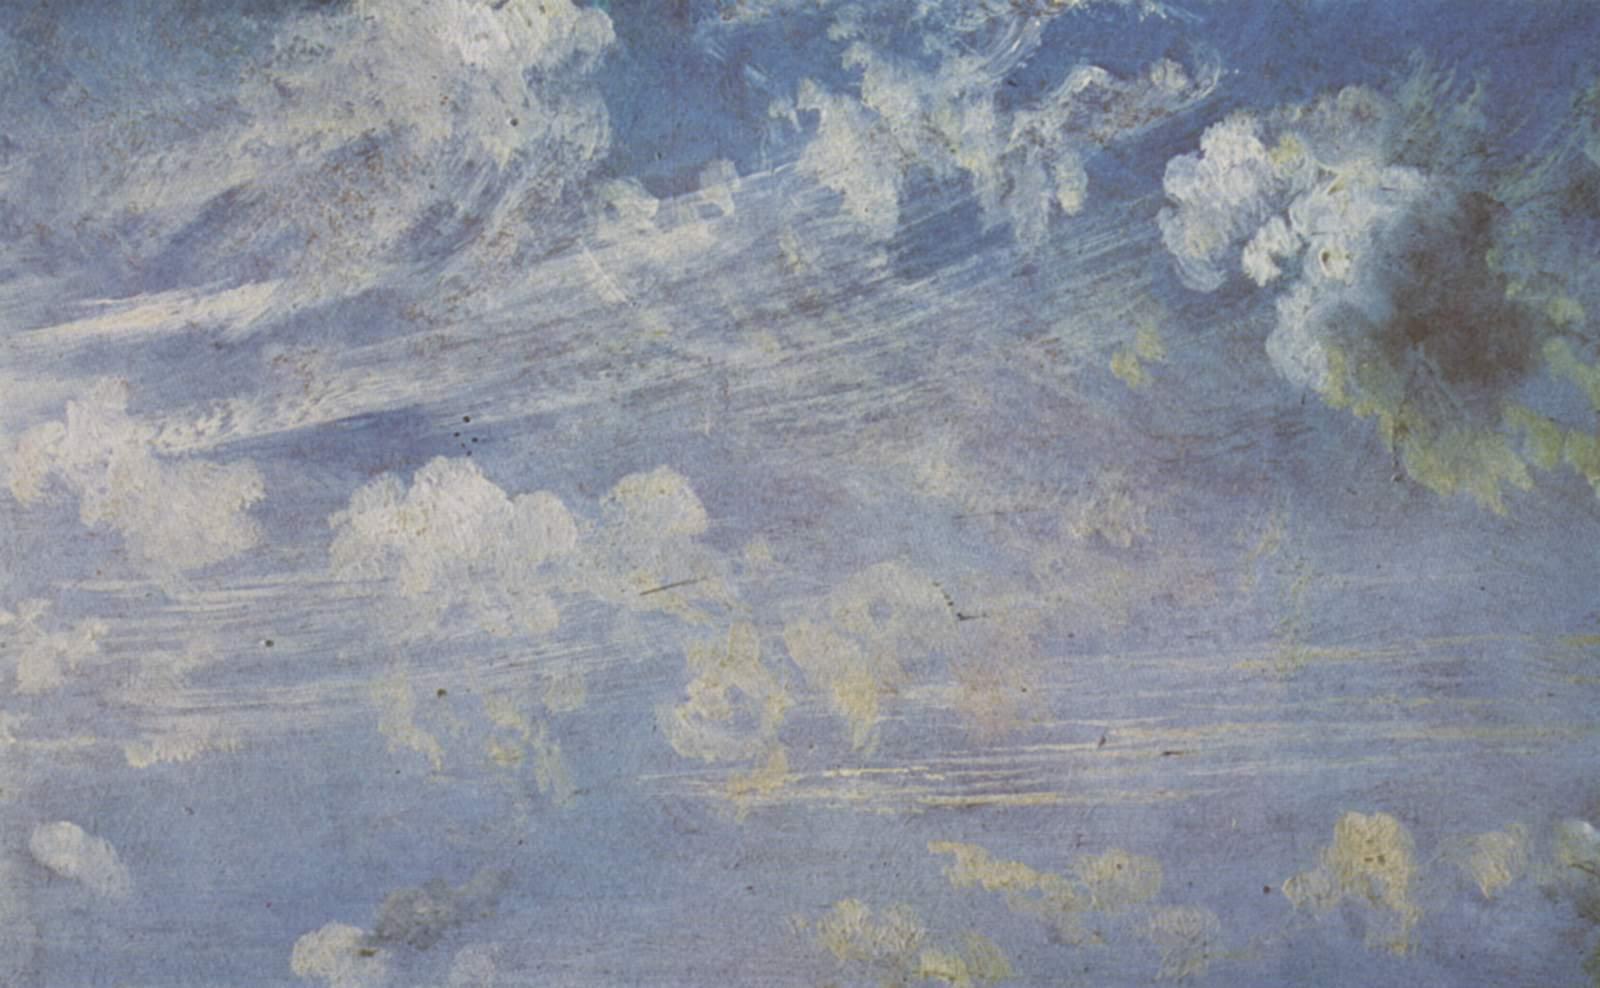 spring-clouds-study-1822.jpg